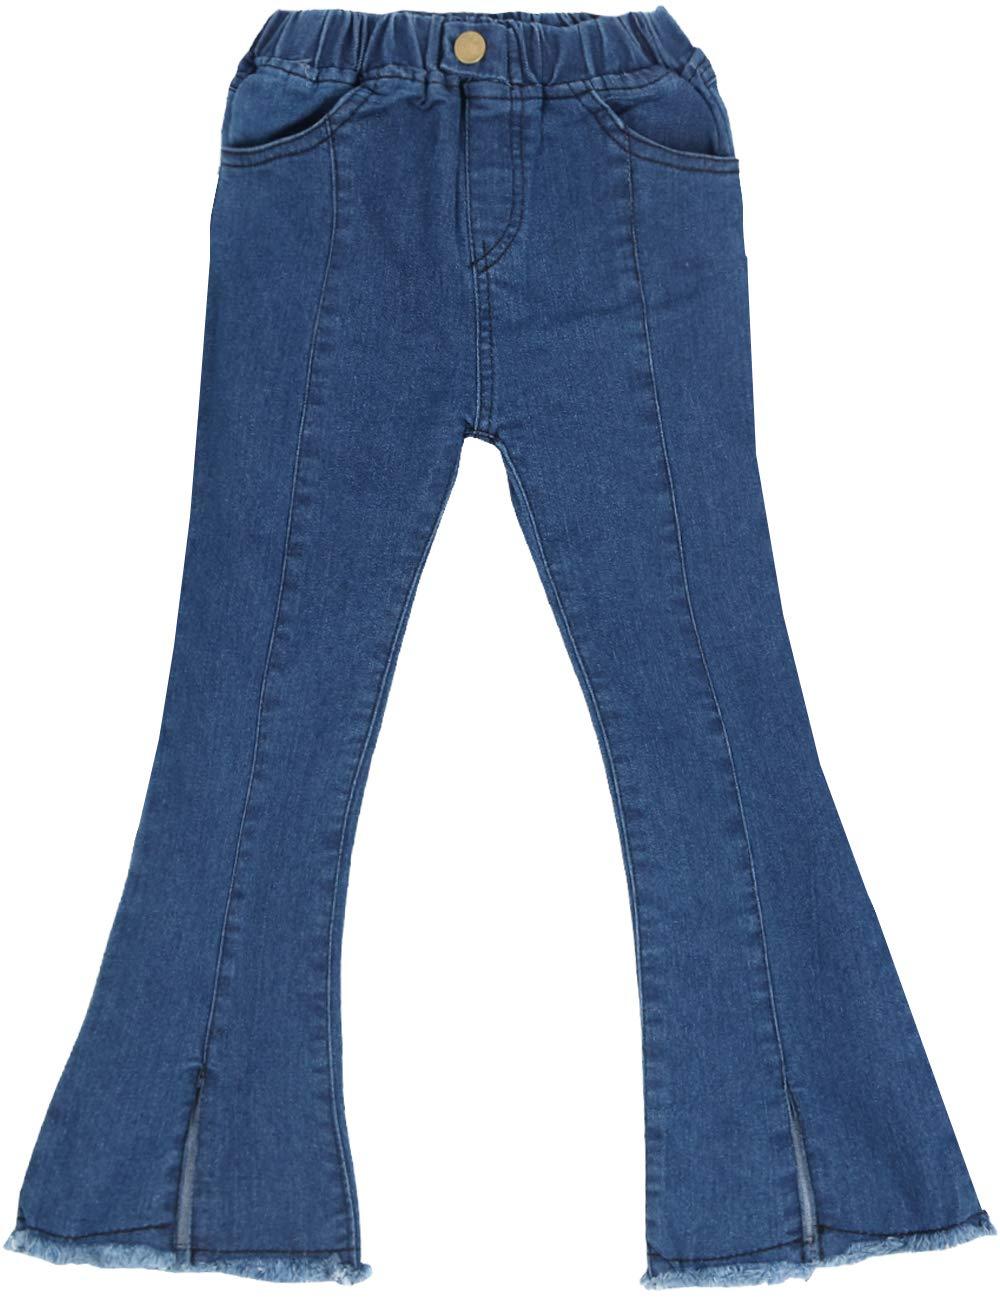 WIYOSHY Girls' Skinny Ripped Bellbottoms Elastic Waist Denim Jeans F919